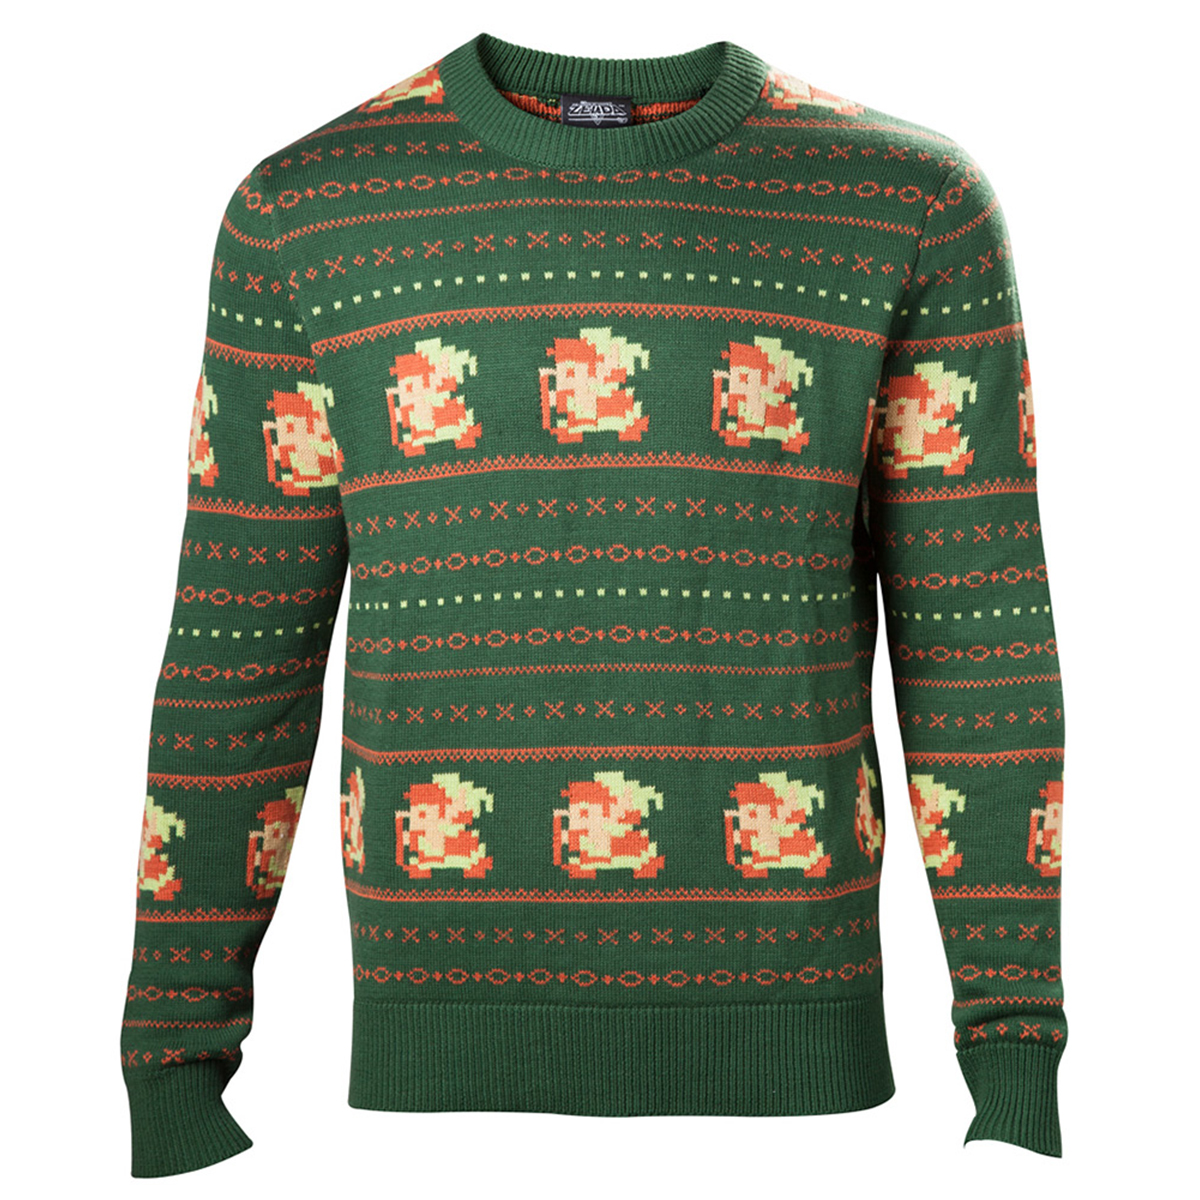 The Legend of Zelda Christmas sweater